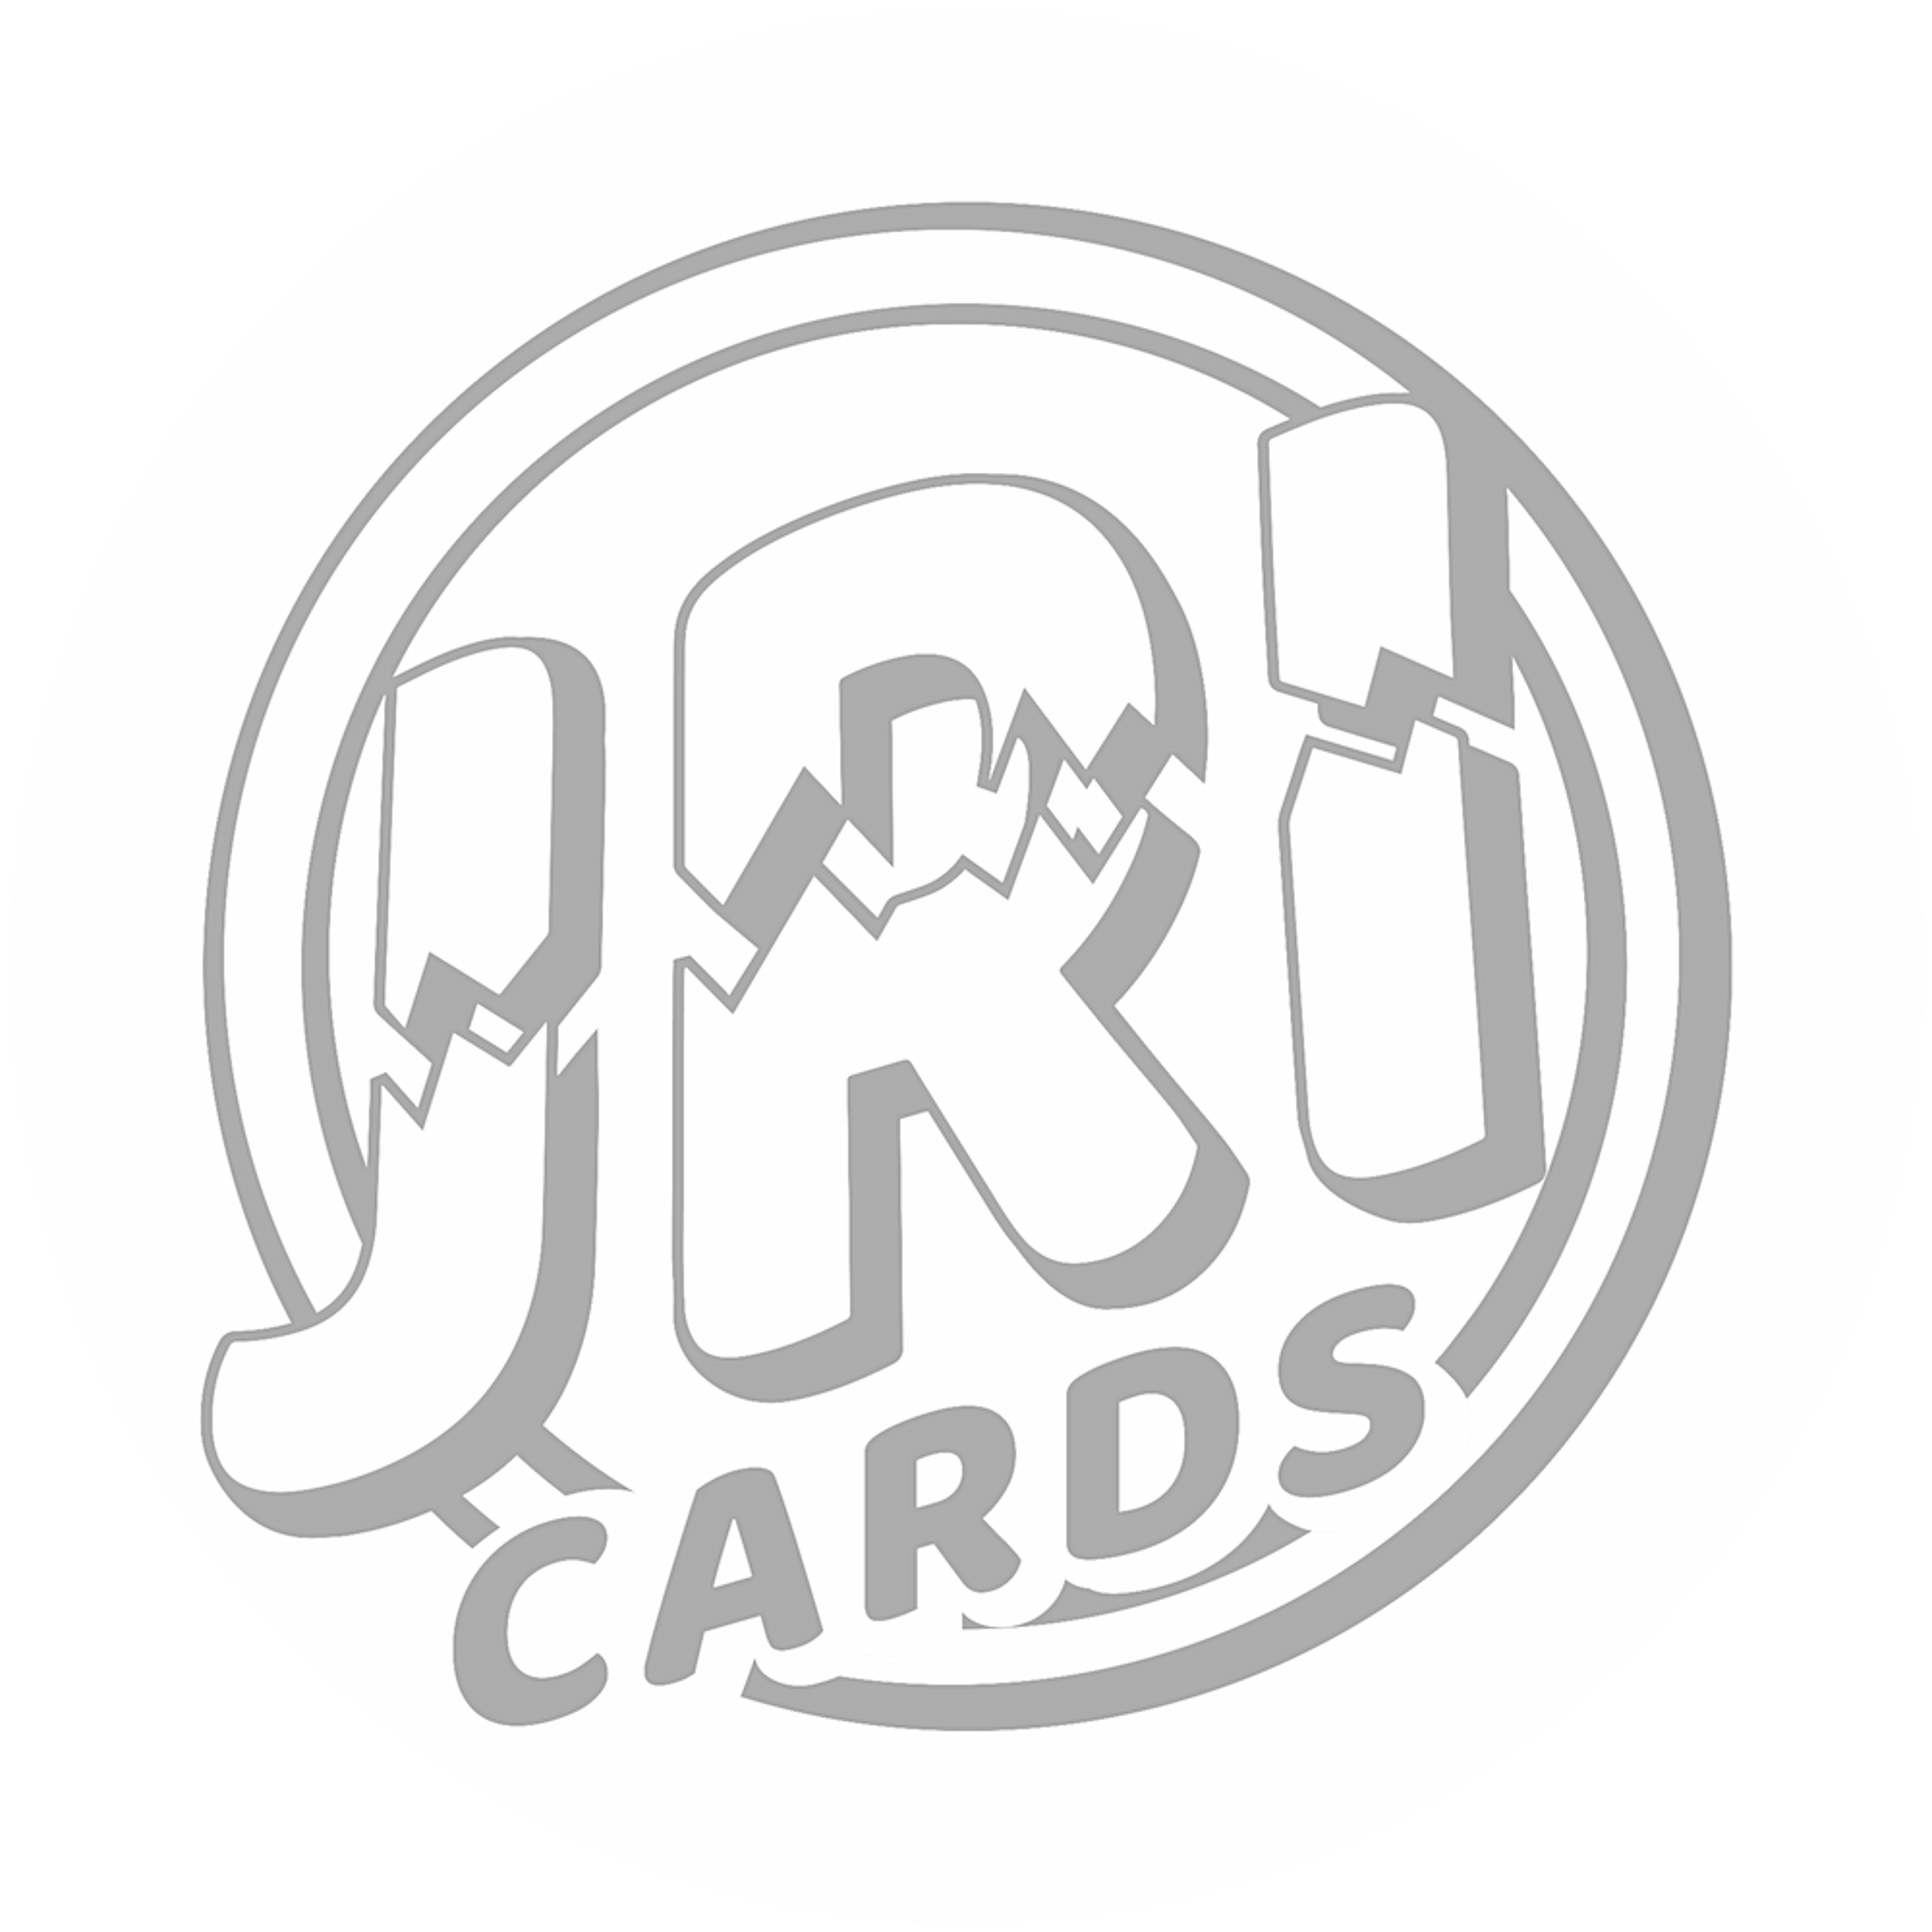 2019 PANINI CROWN ROYALE BASKETBALL HOBBY BOX (8 CARDS AVAILABLE)